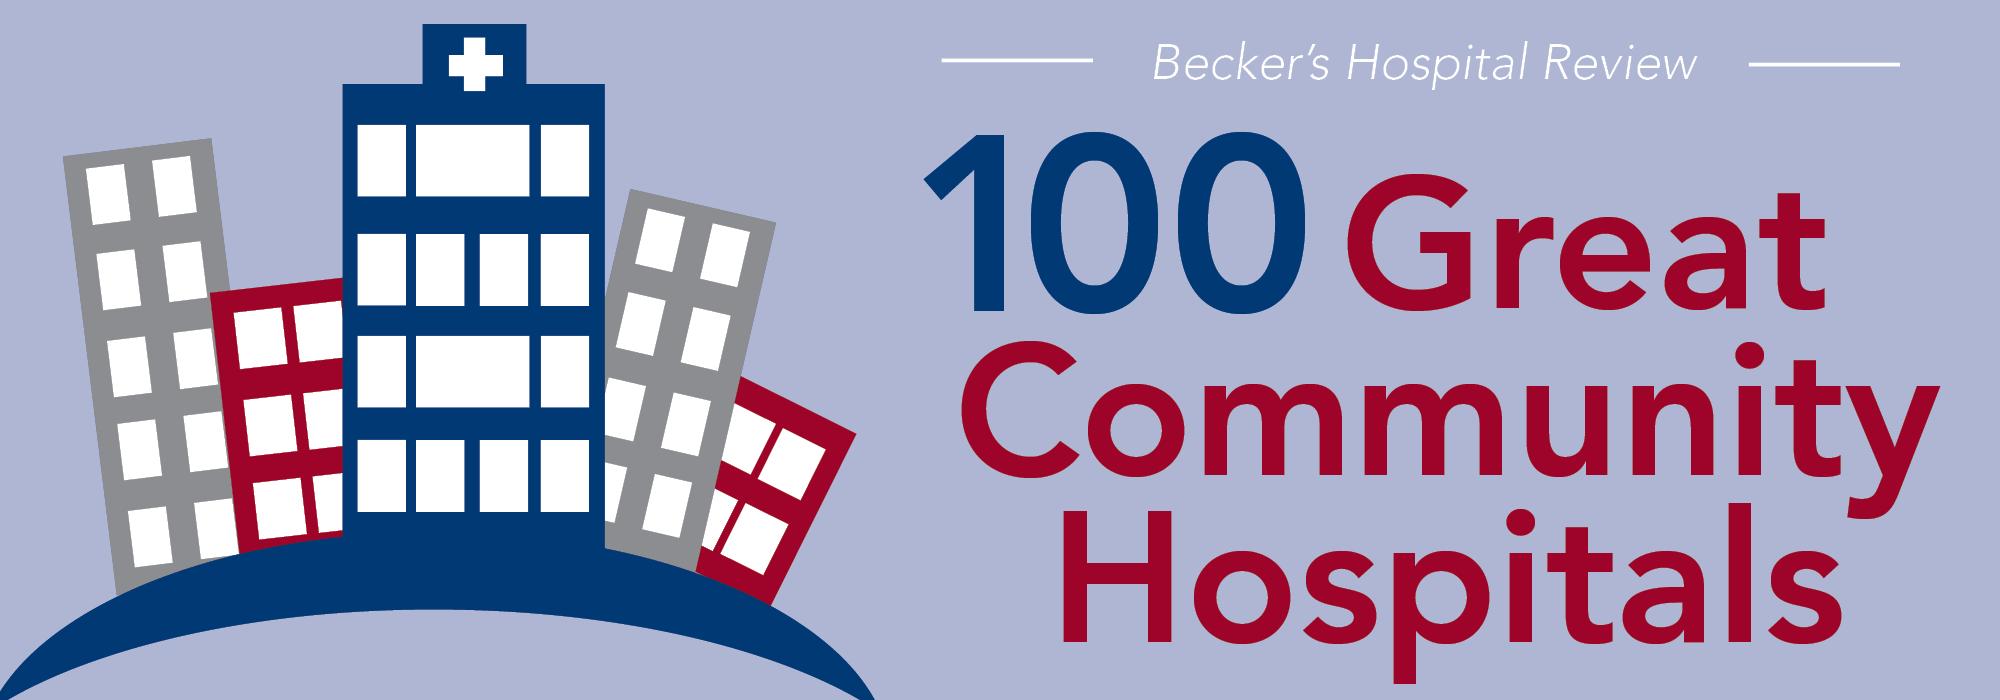 Great Community Hospitals 2016 Logo